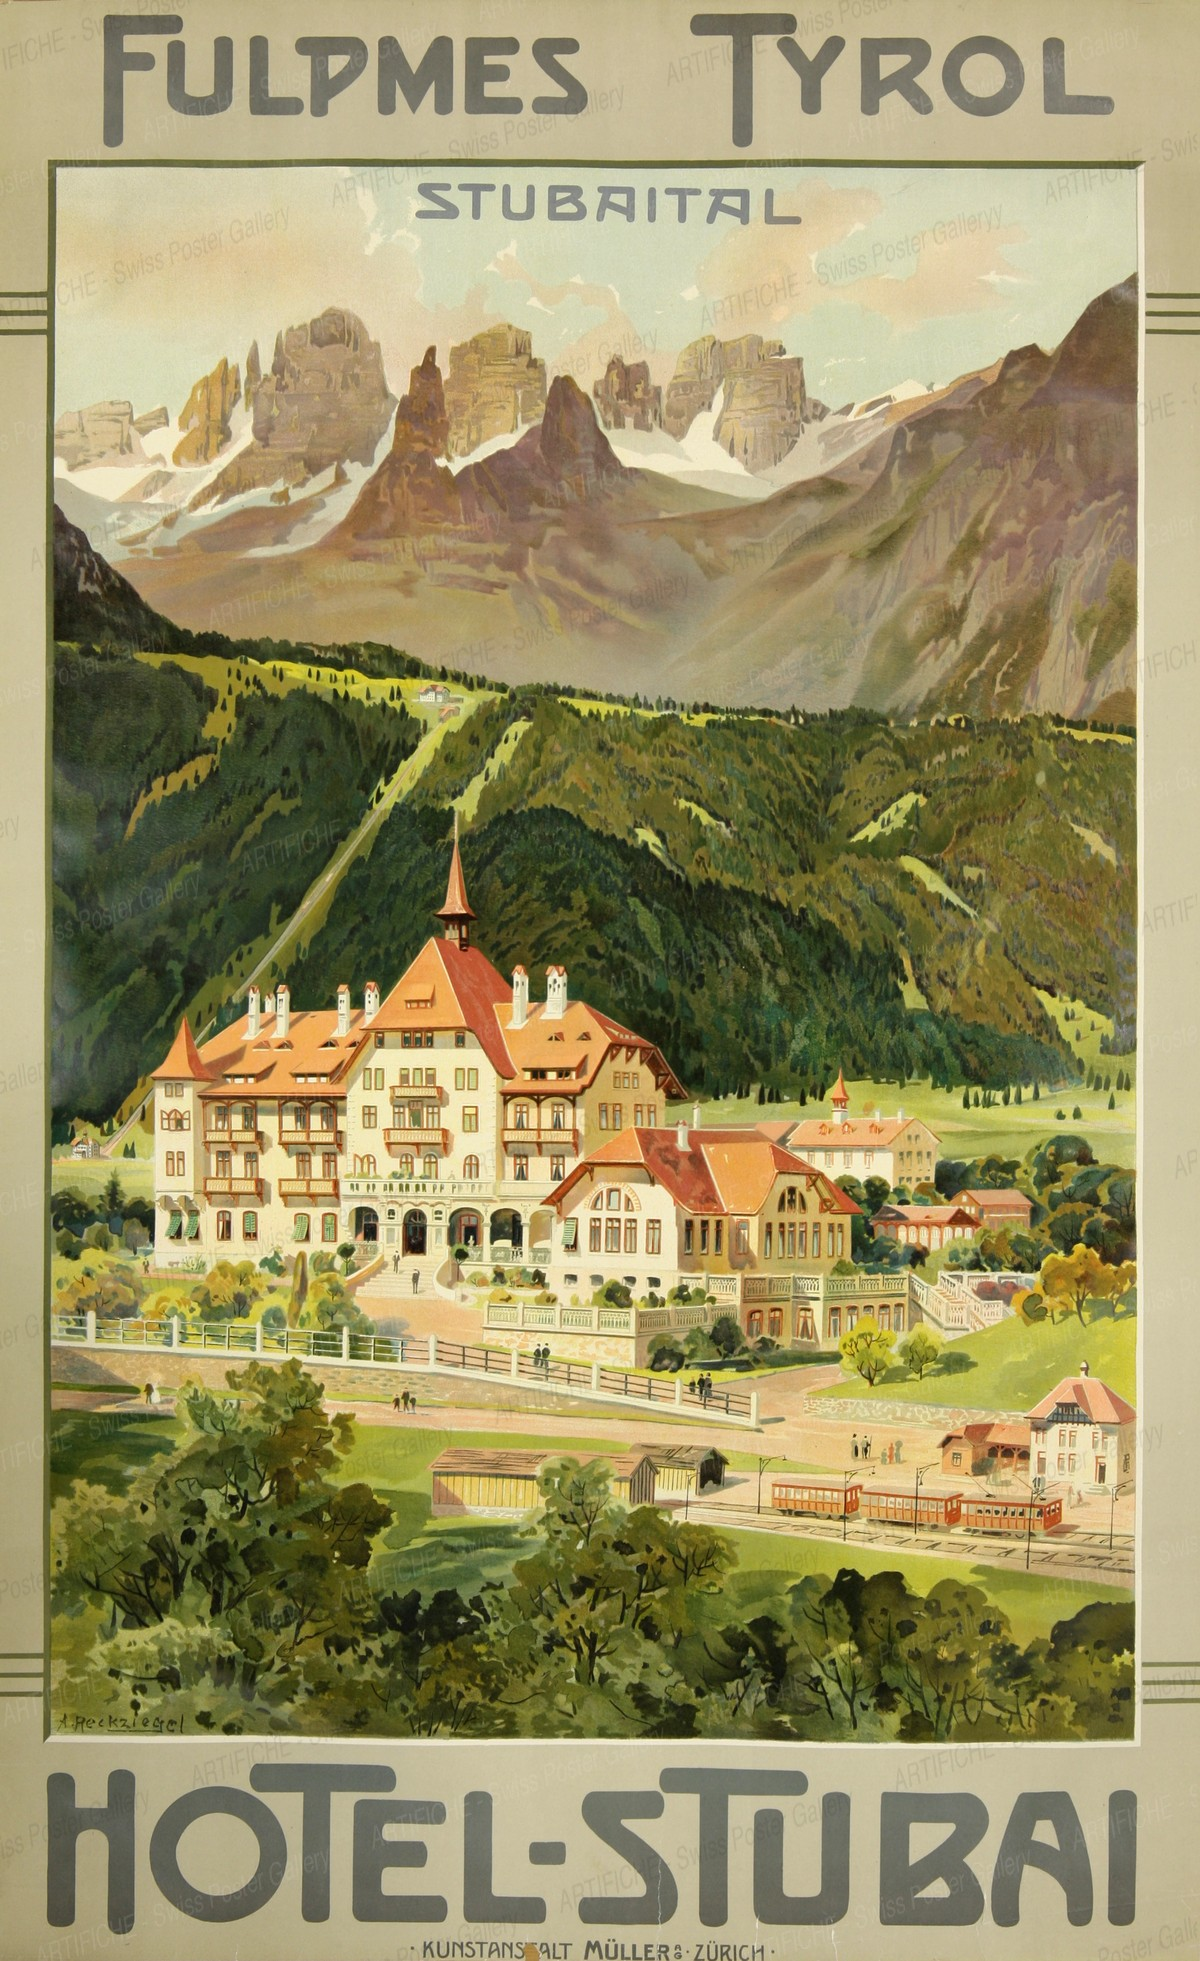 Fulpmes Tyrol – Hotel Stubai, Anton Reckziegel